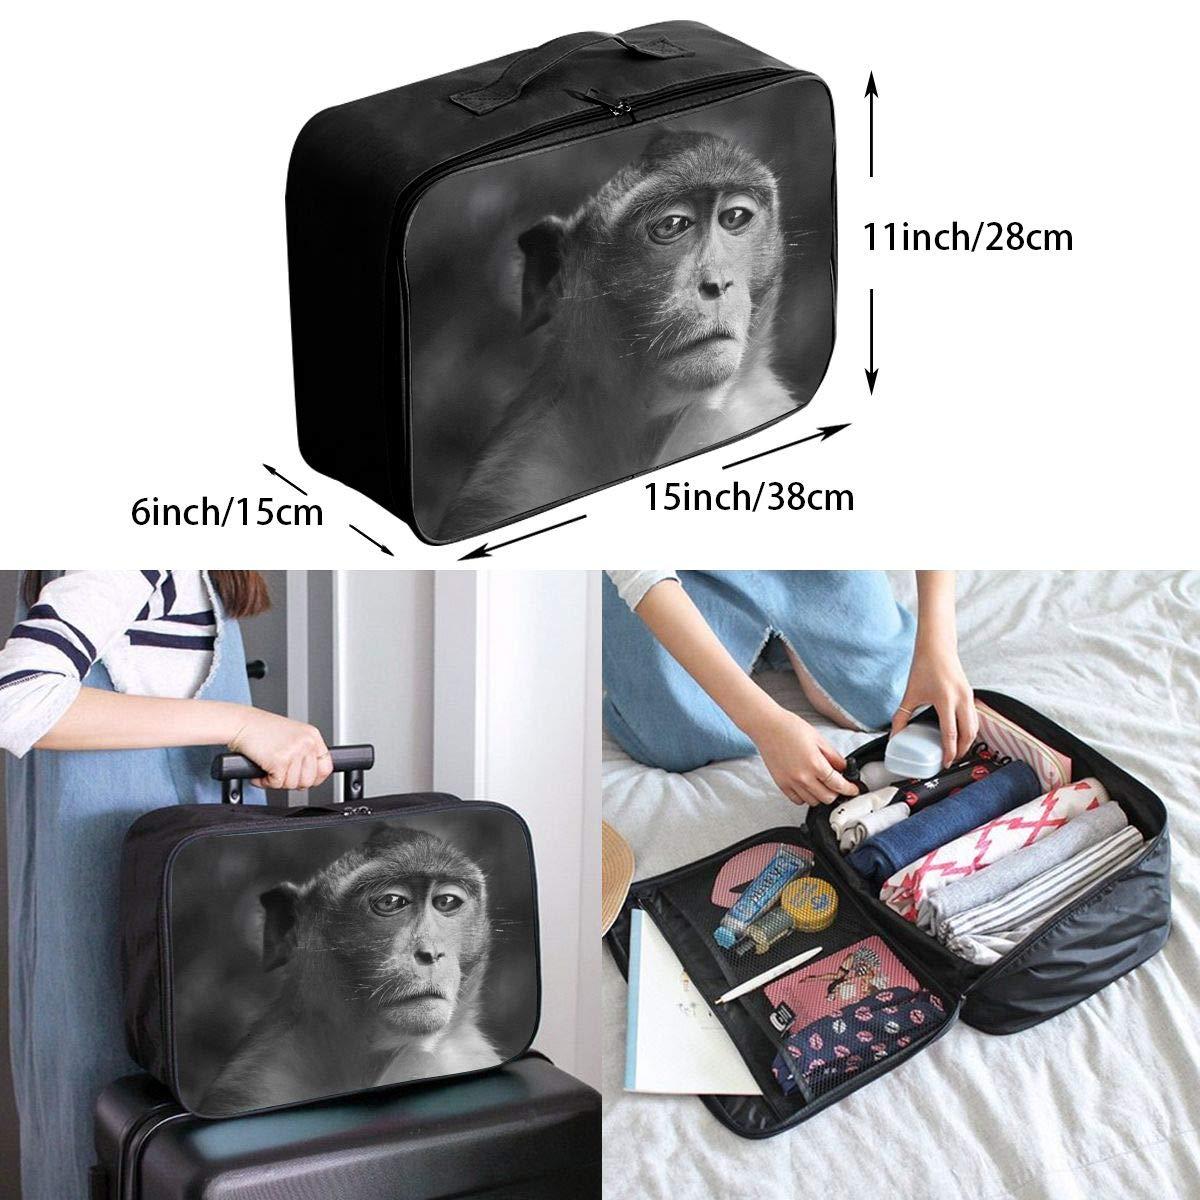 Travel Luggage Duffle Bag Lightweight Portable Handbag Sad Monkey Pattern Large Capacity Waterproof Foldable Storage Tote